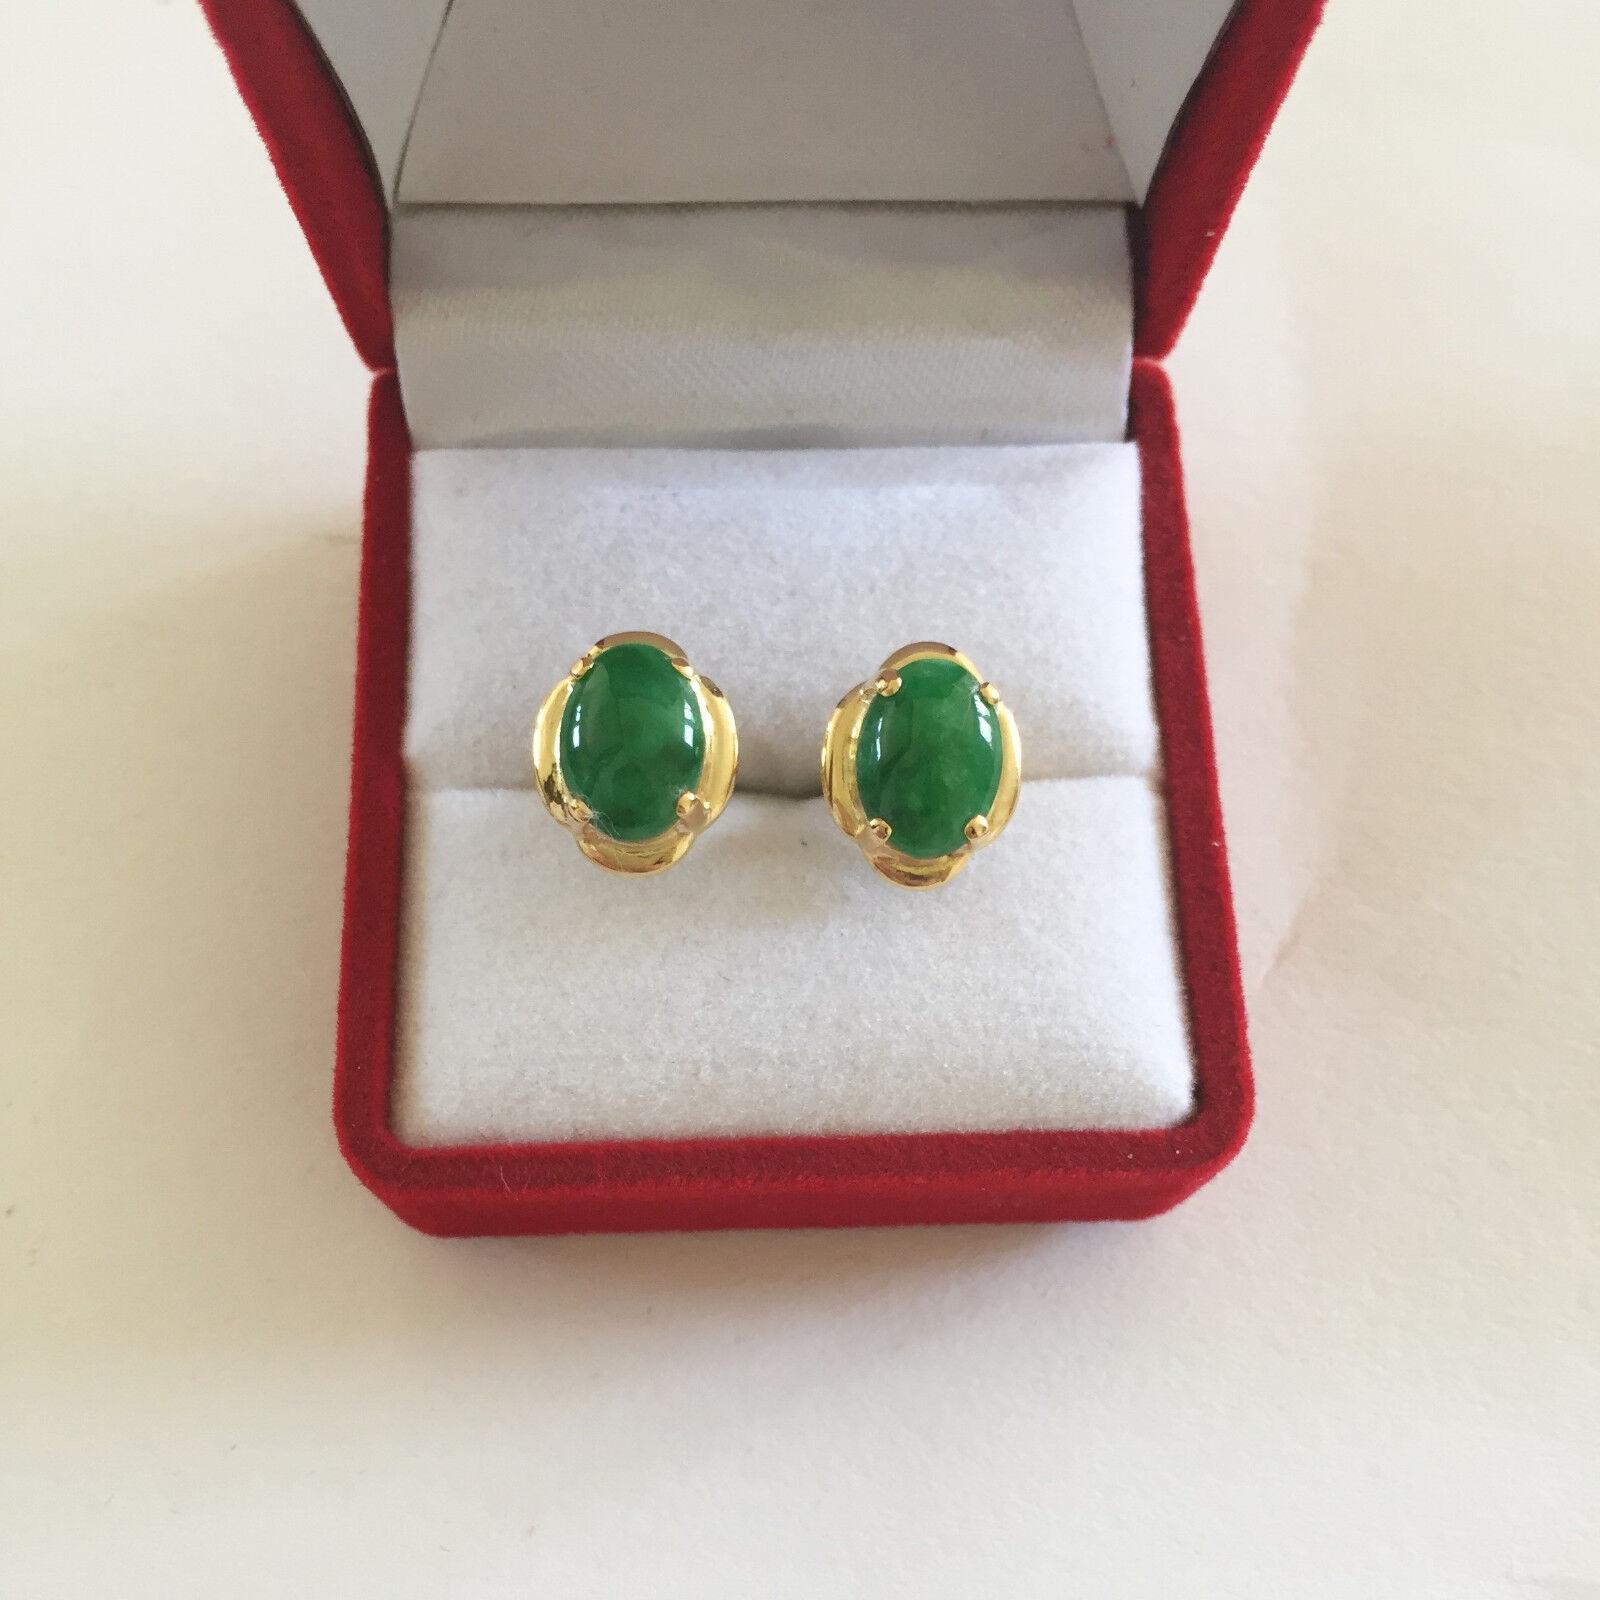 14K Yellow gold Jade Earrings - E112